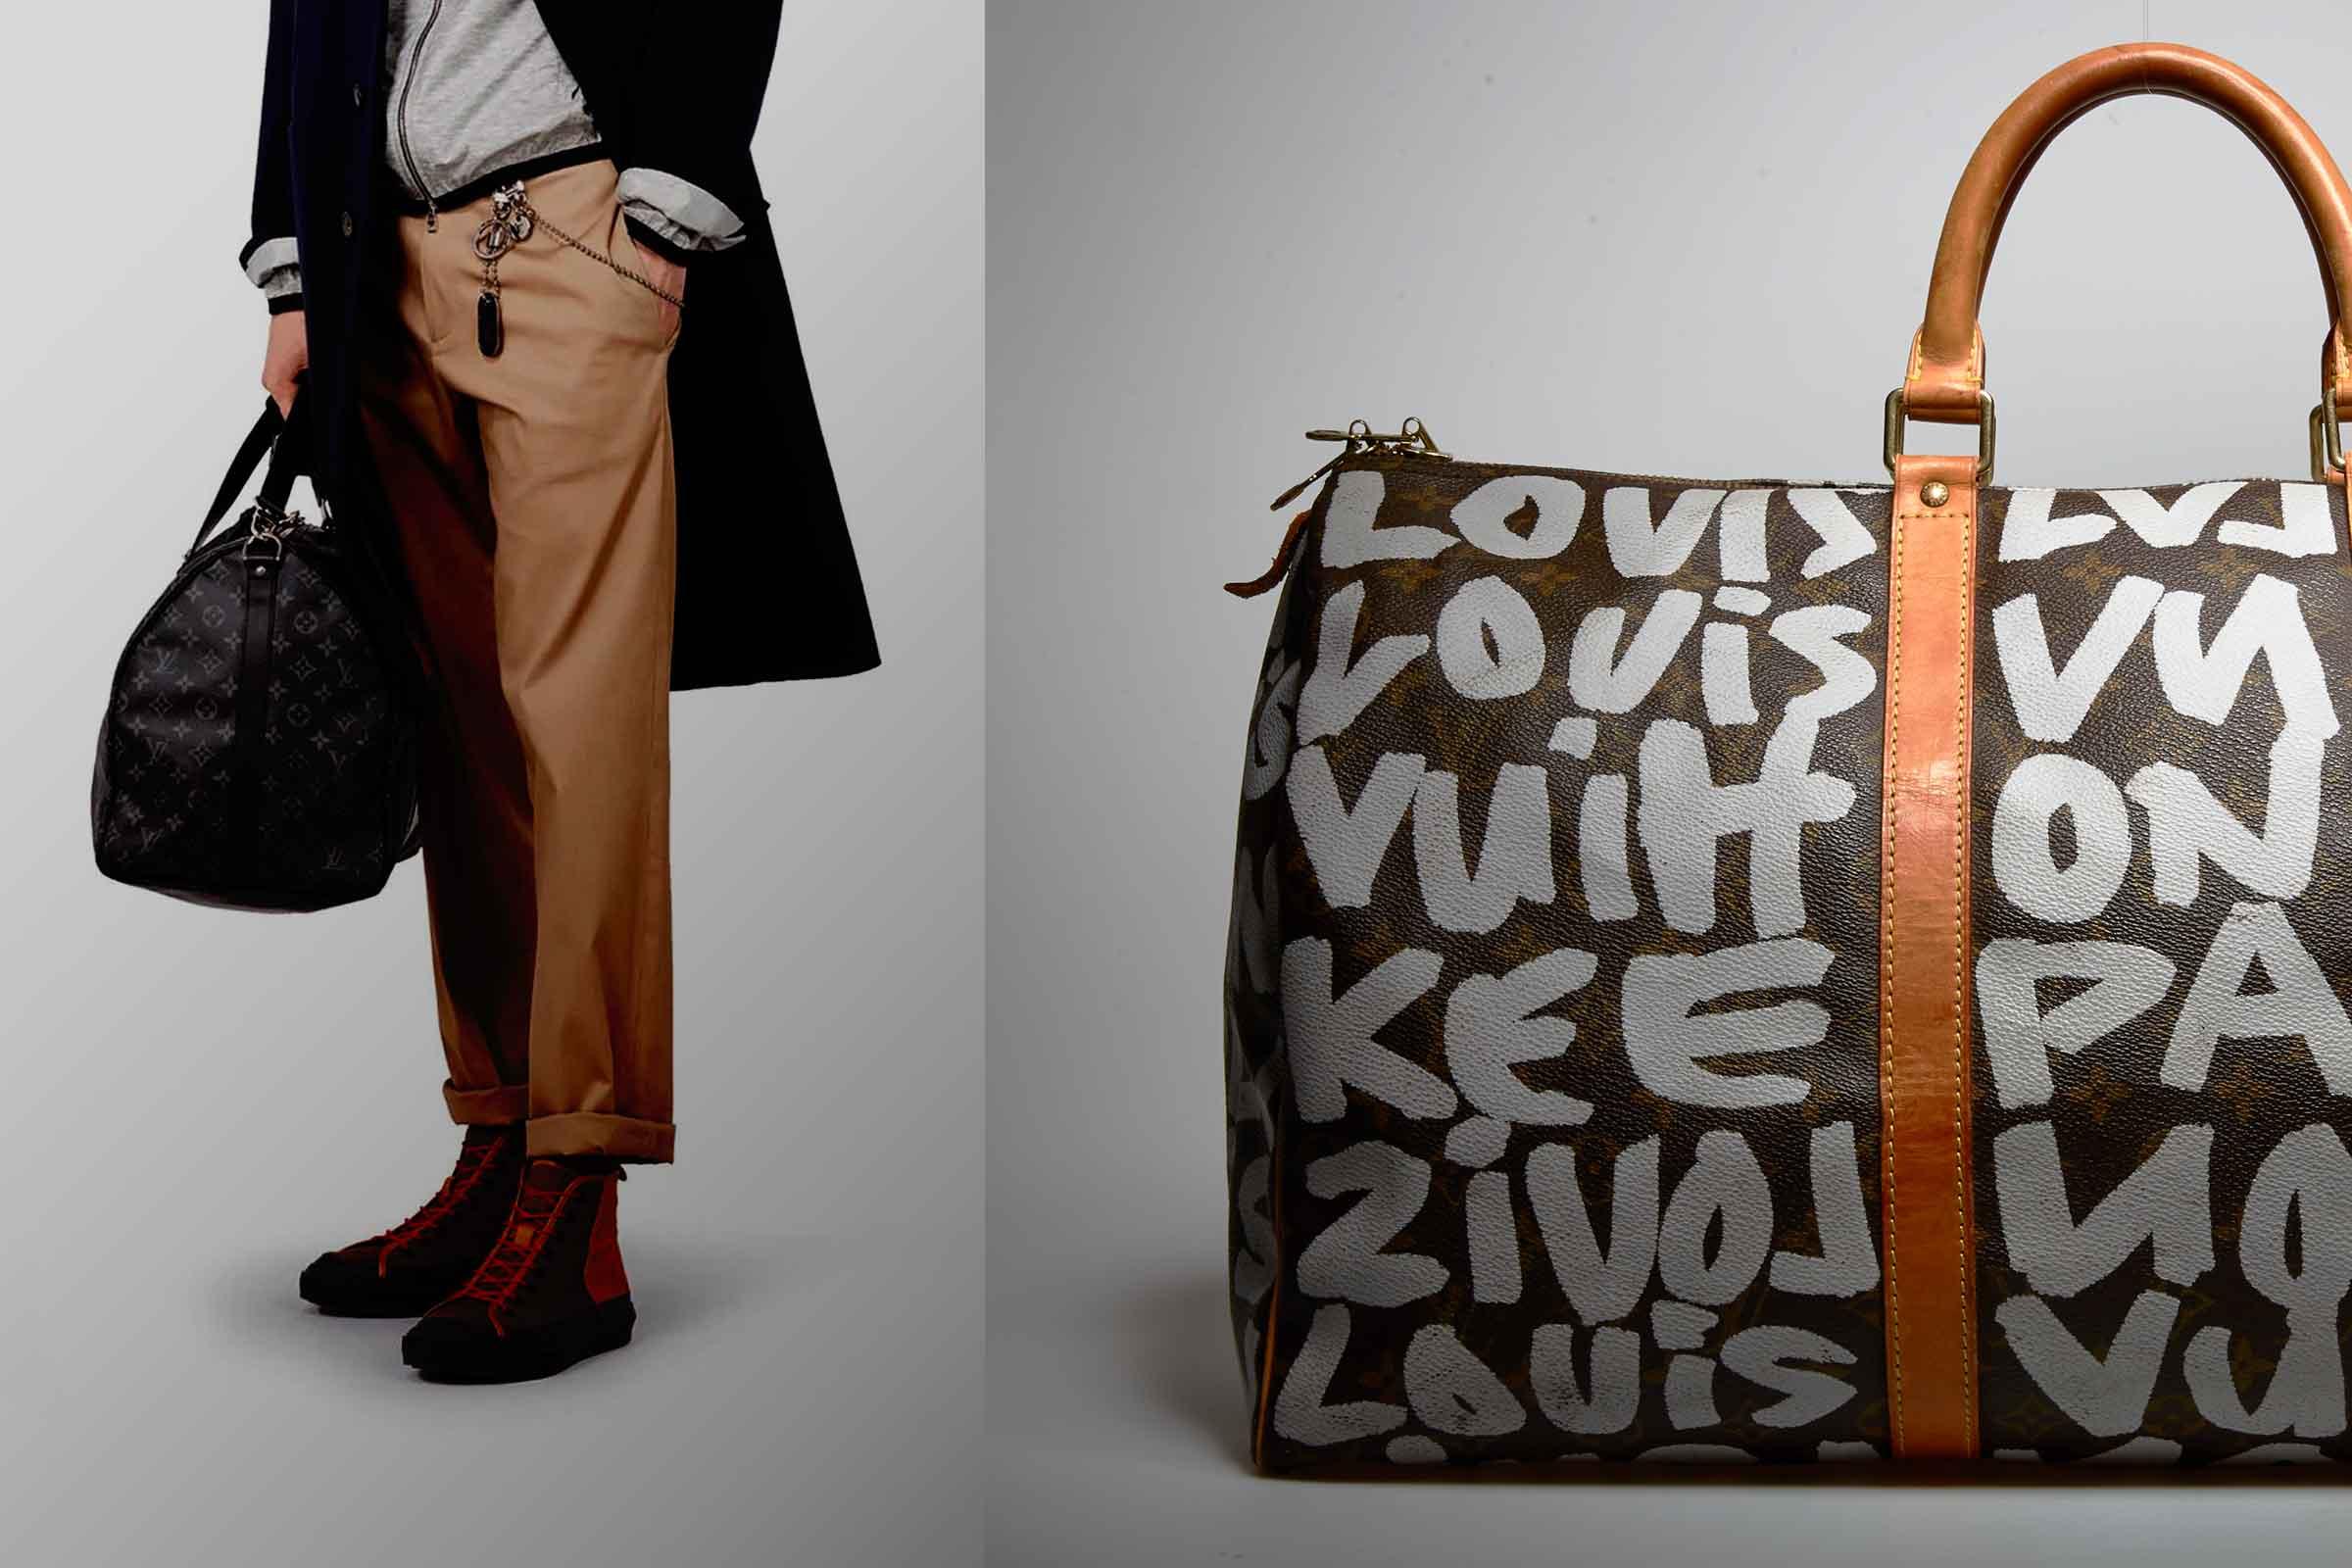 Luxury leather backpack travel bag weekender sports bag gym bag leather shoulder ladies mens bag satchel original made in Italy red brown